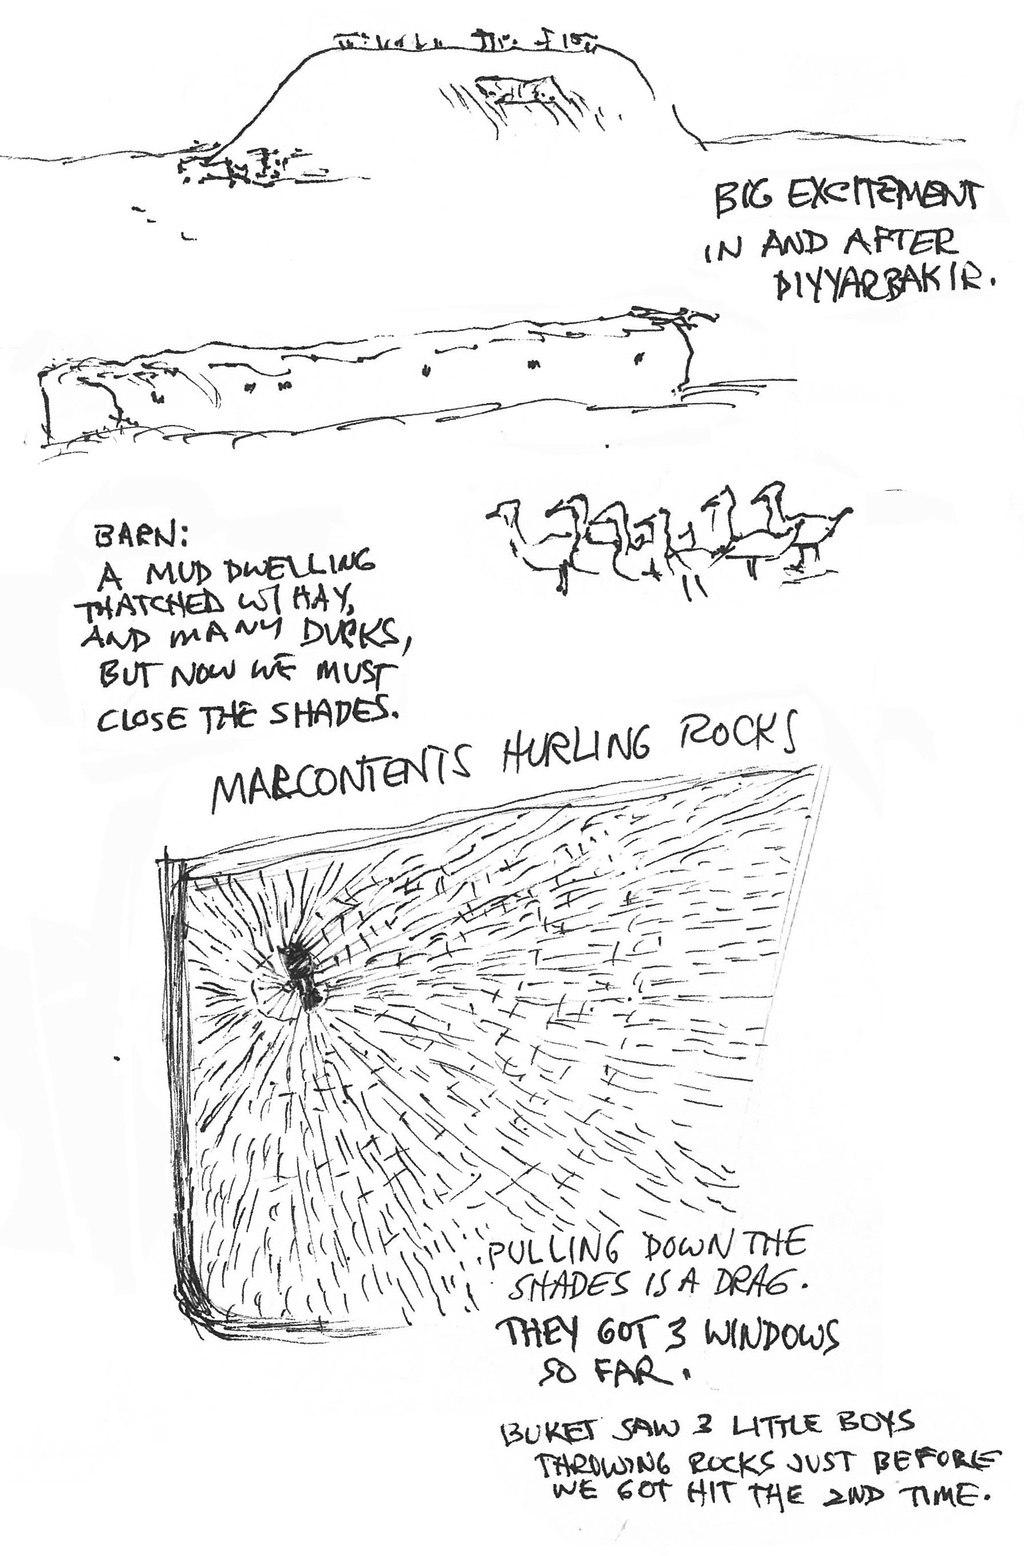 Malcontents Hurling Rocks